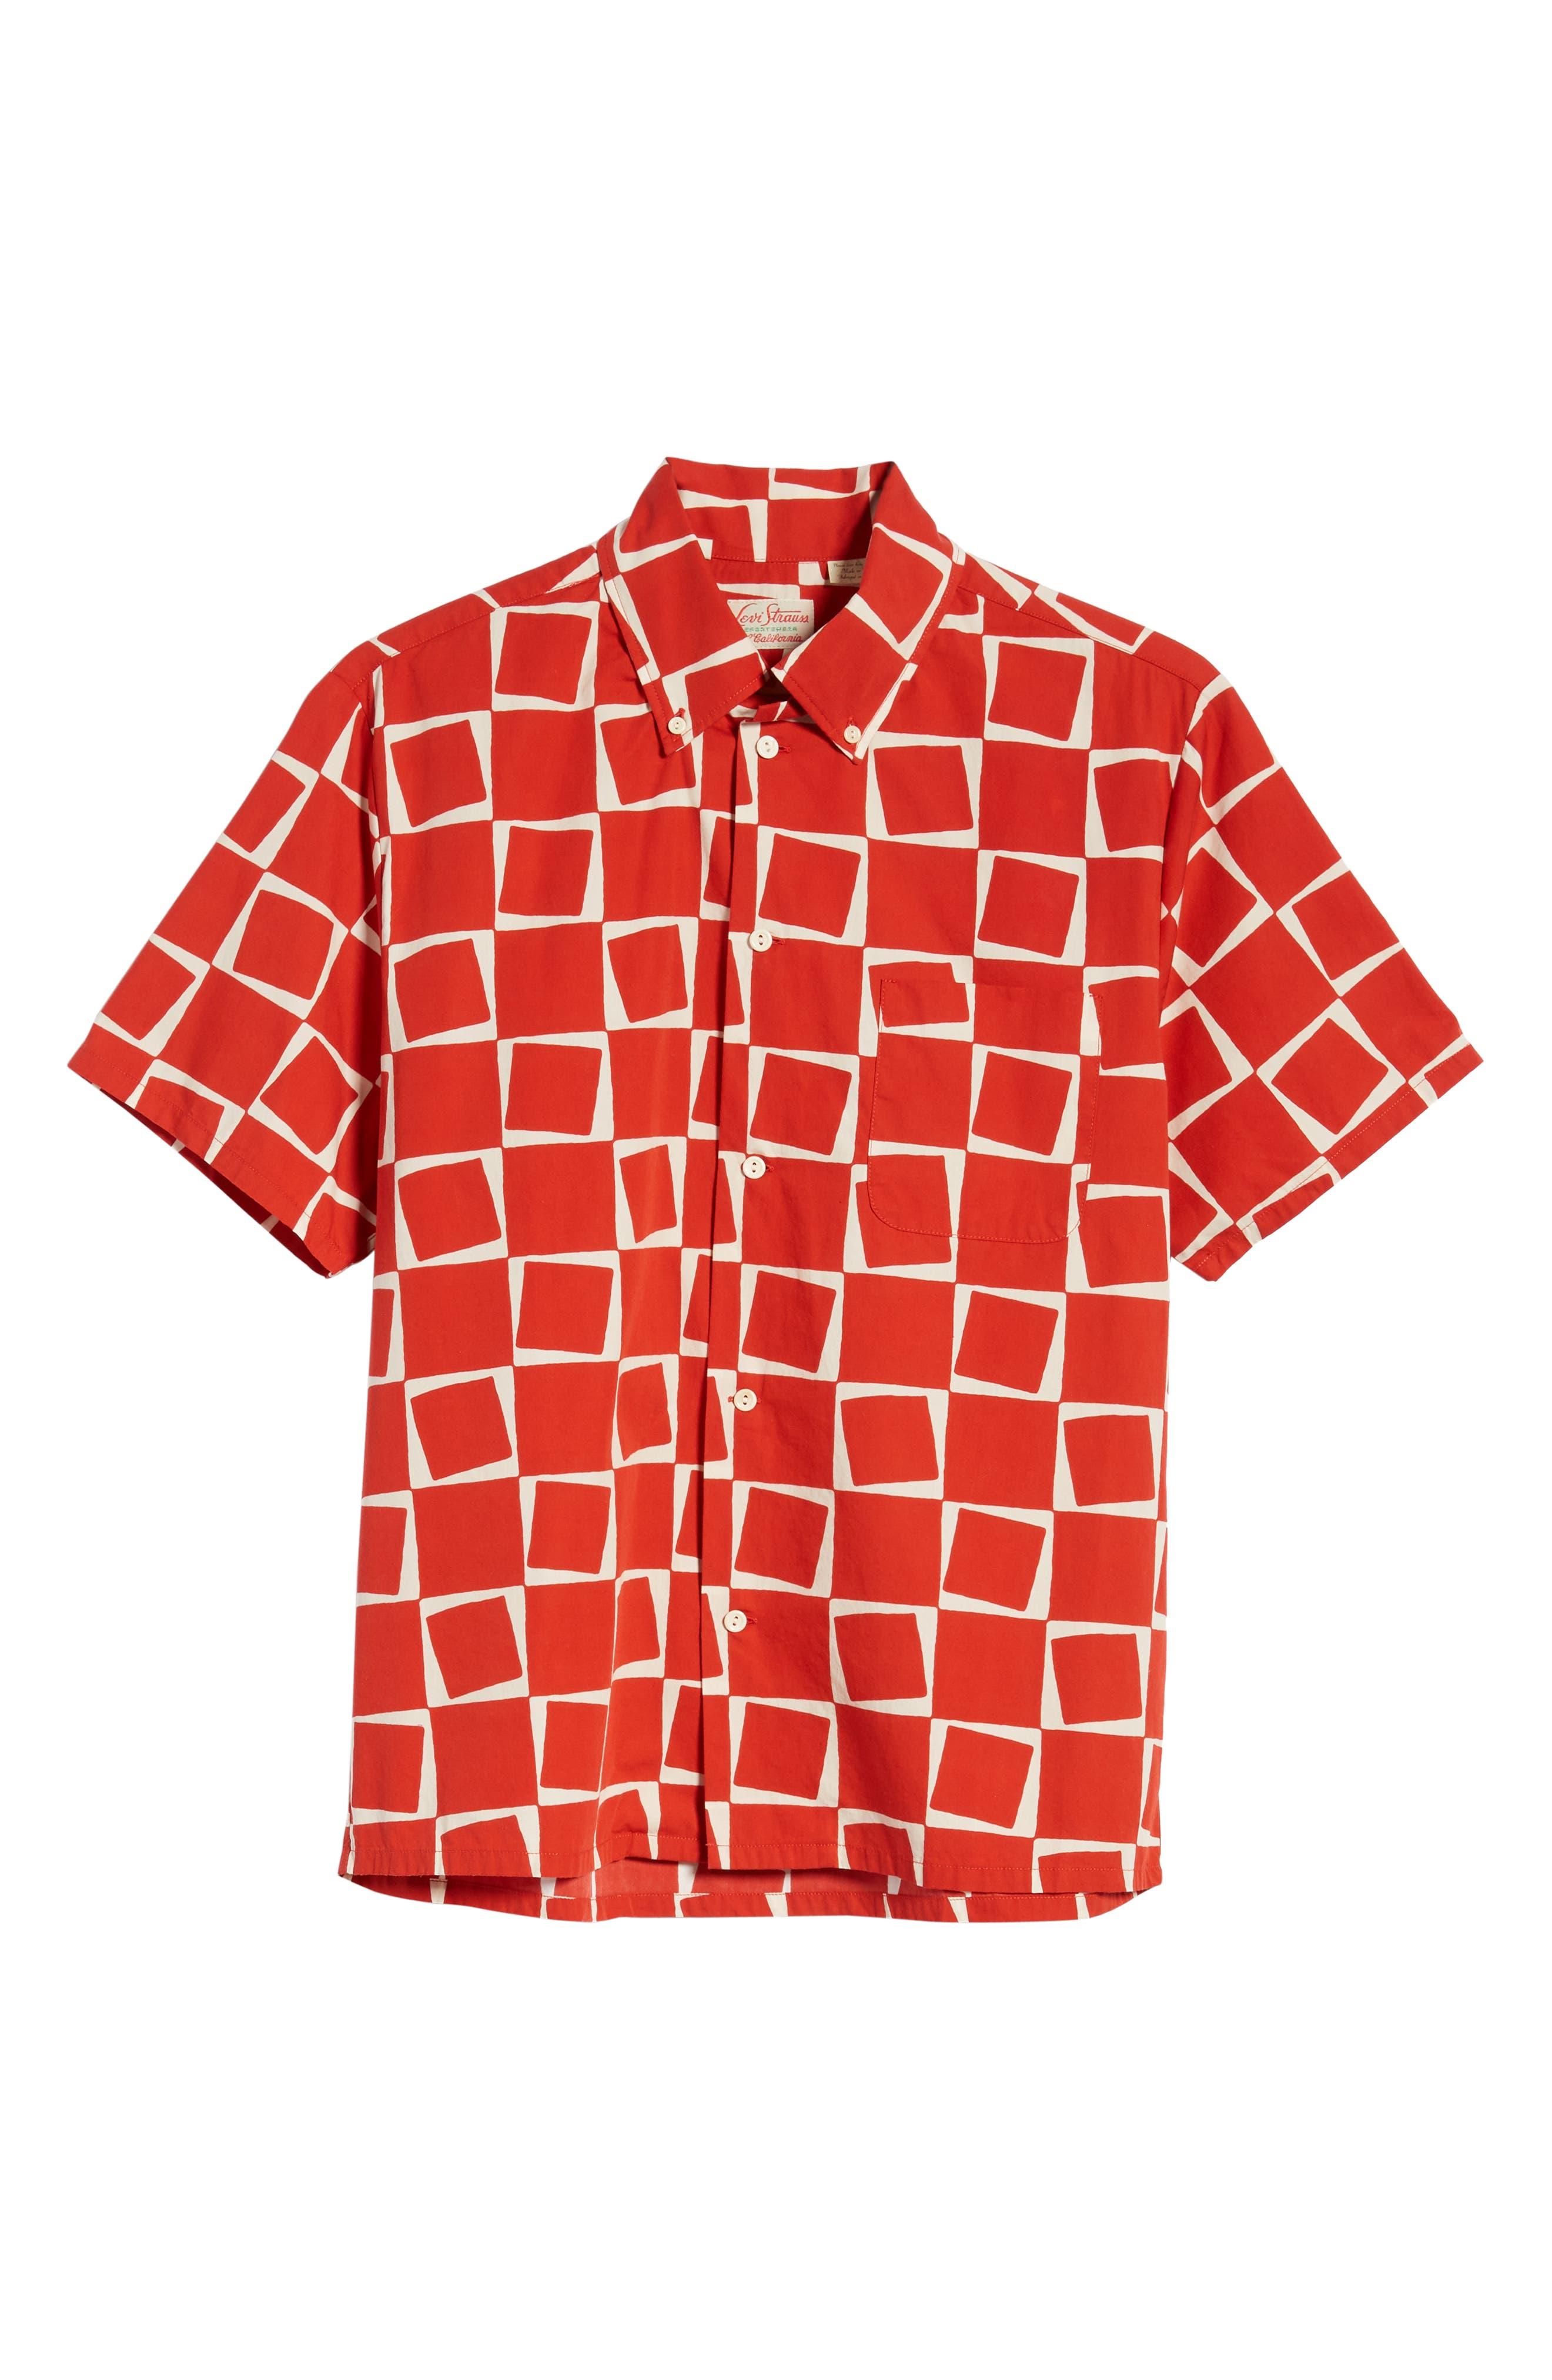 LEVI'S<SUP>®</SUP> VINTAGE CLOTHING, 1950s Regular Atomic Square Woven Shirt, Alternate thumbnail 5, color, 600